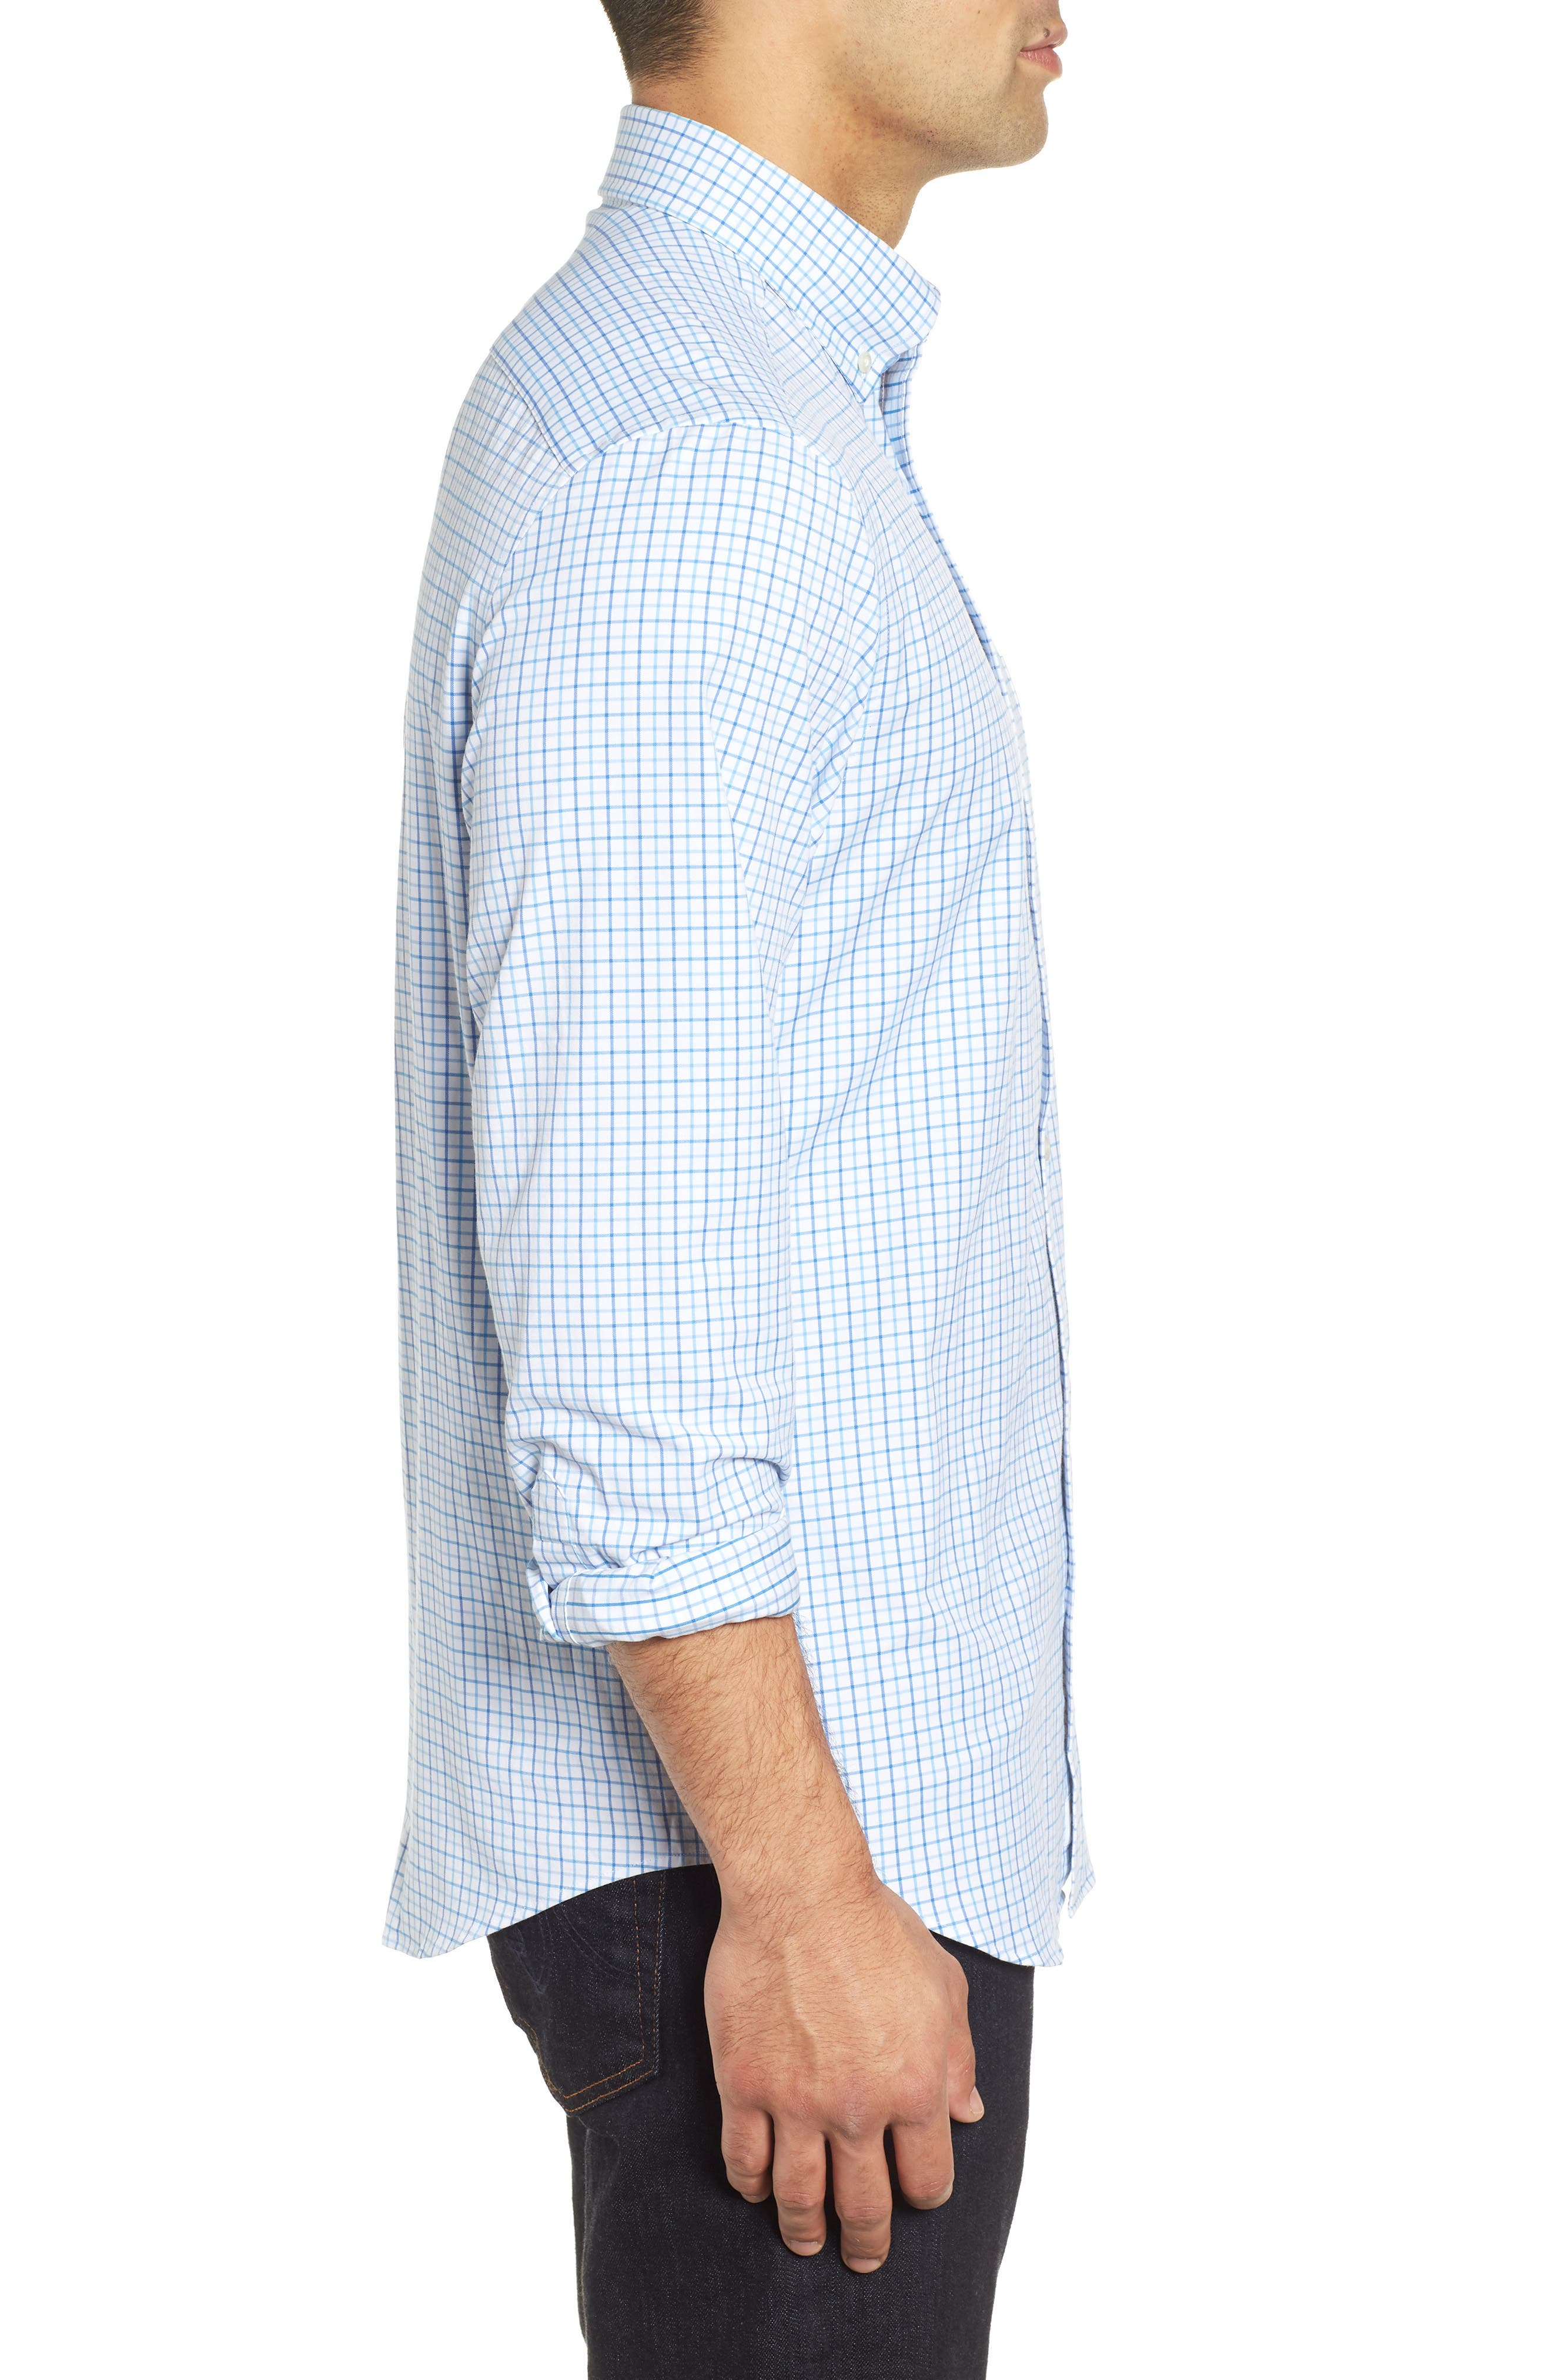 Pepperbush Regular Fit Plaid Sport Shirt,                             Alternate thumbnail 4, color,                             427